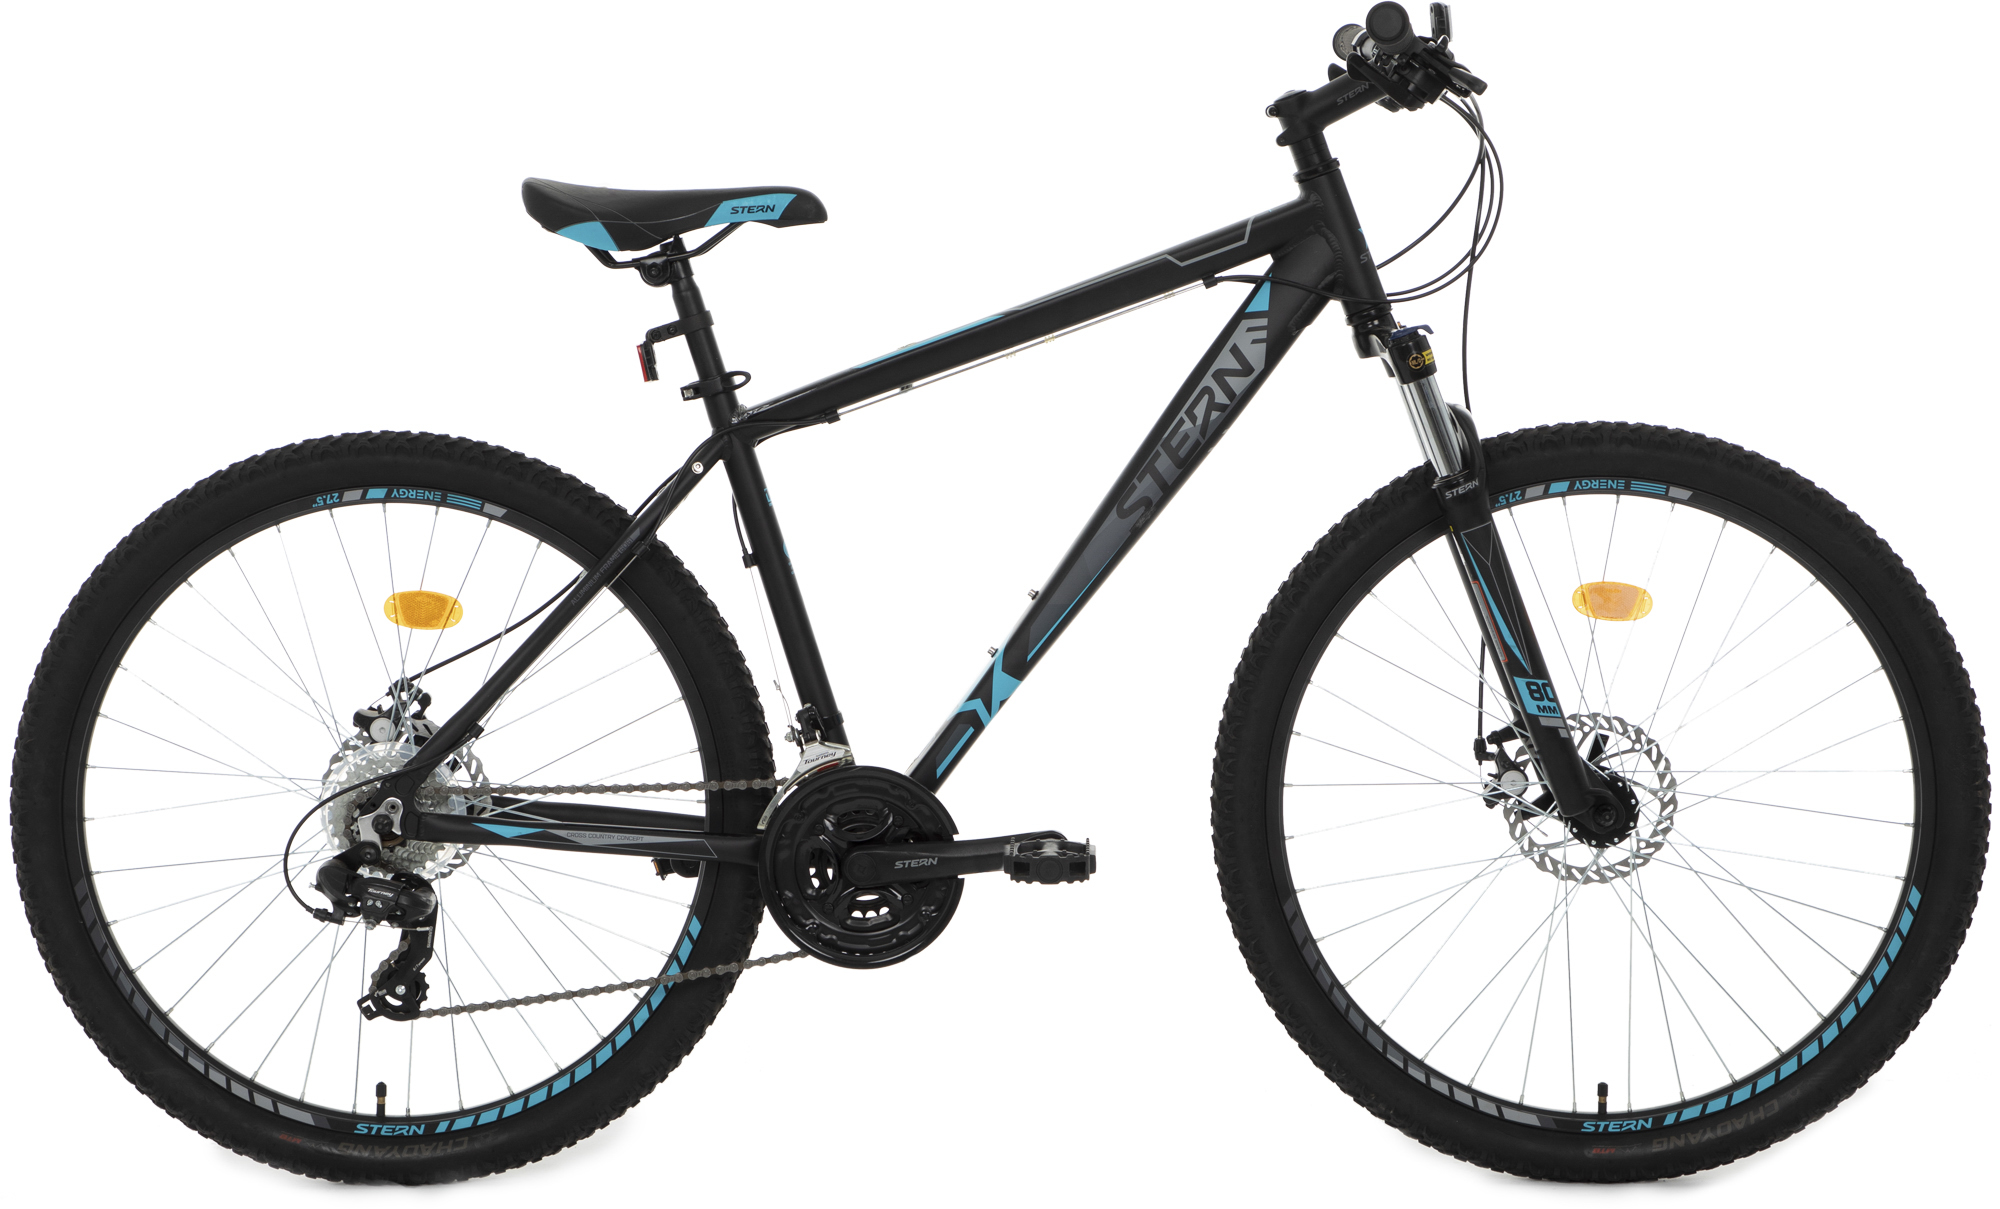 Stern Велосипед горный Stern Energy 2.0 27,5 stern stern motion 4 0 27 5 2018